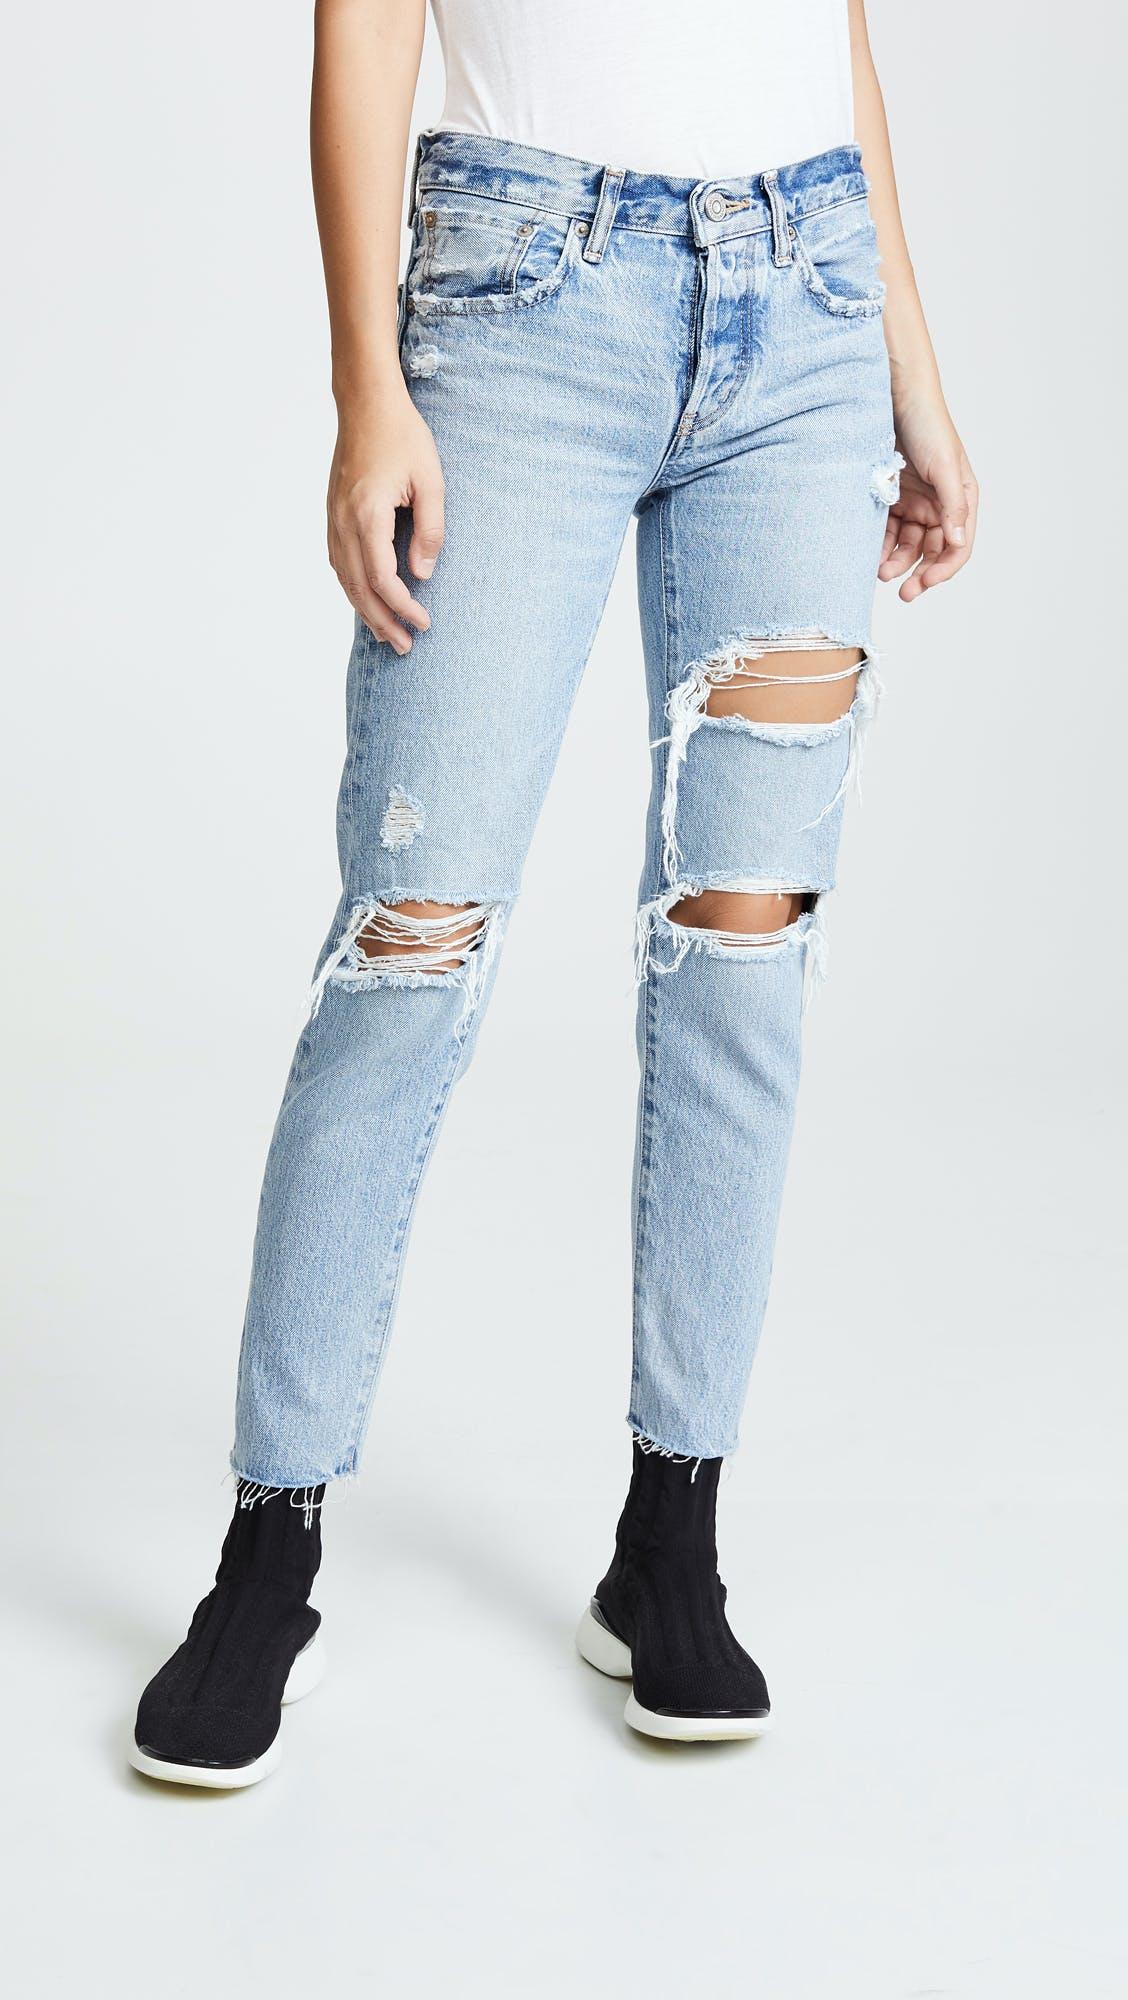 Branford Tapered Jeans